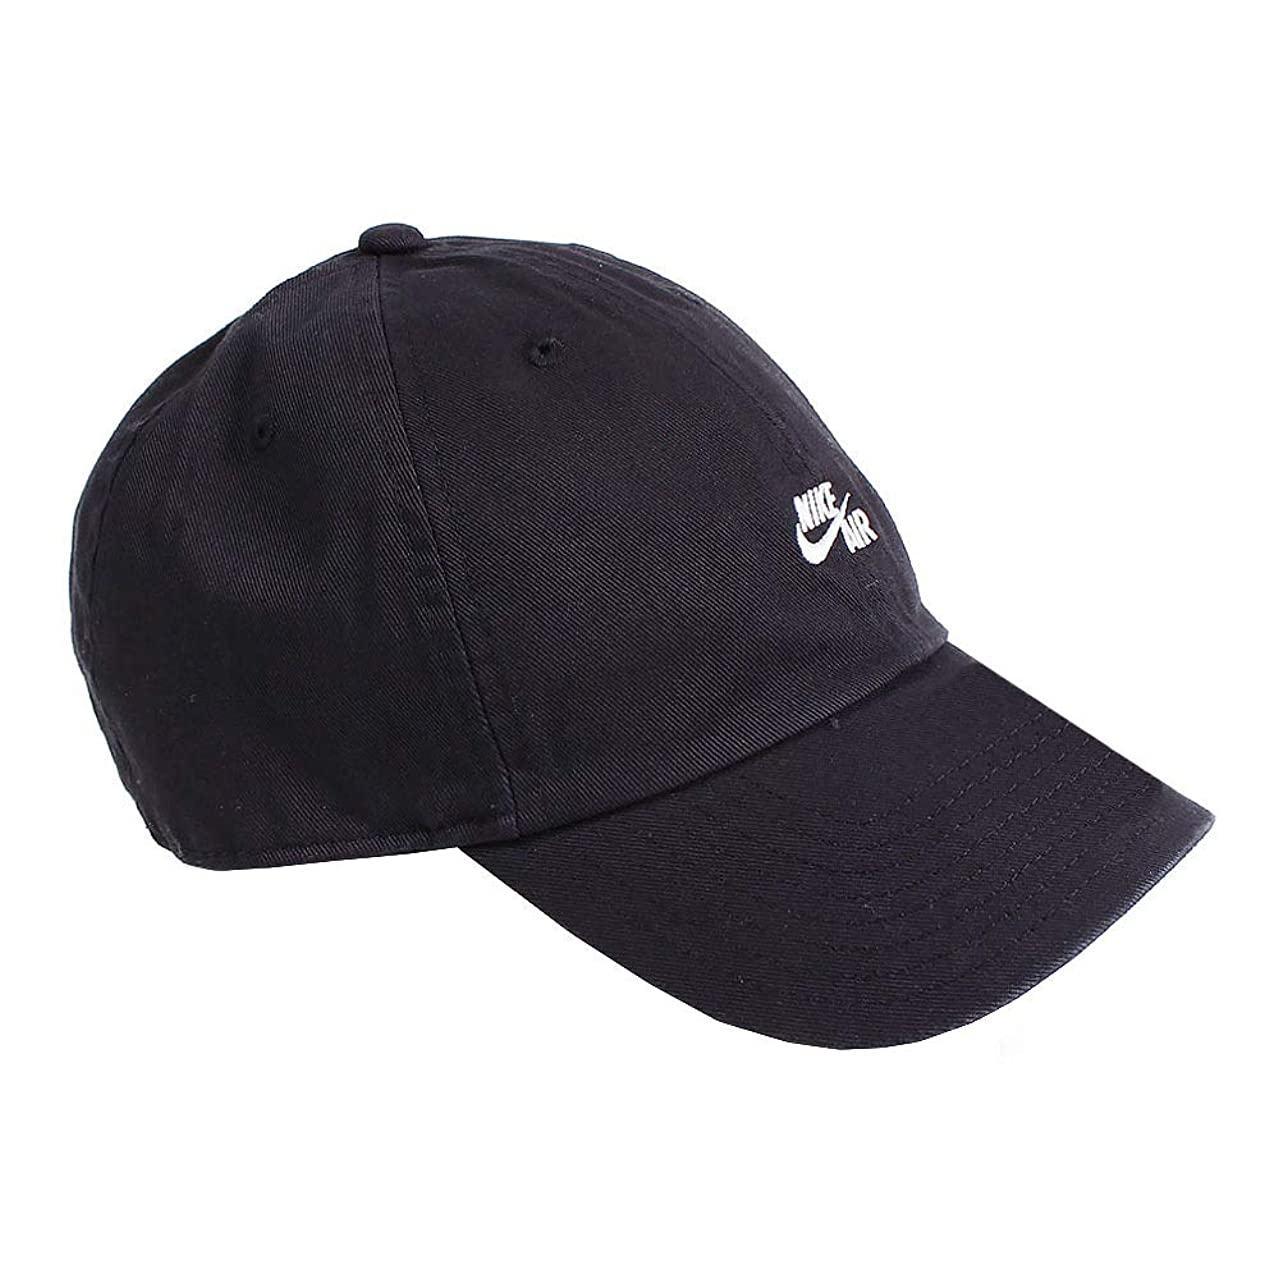 Nike Sportswear Air Heritage 86 Cap Black/White 891289-010